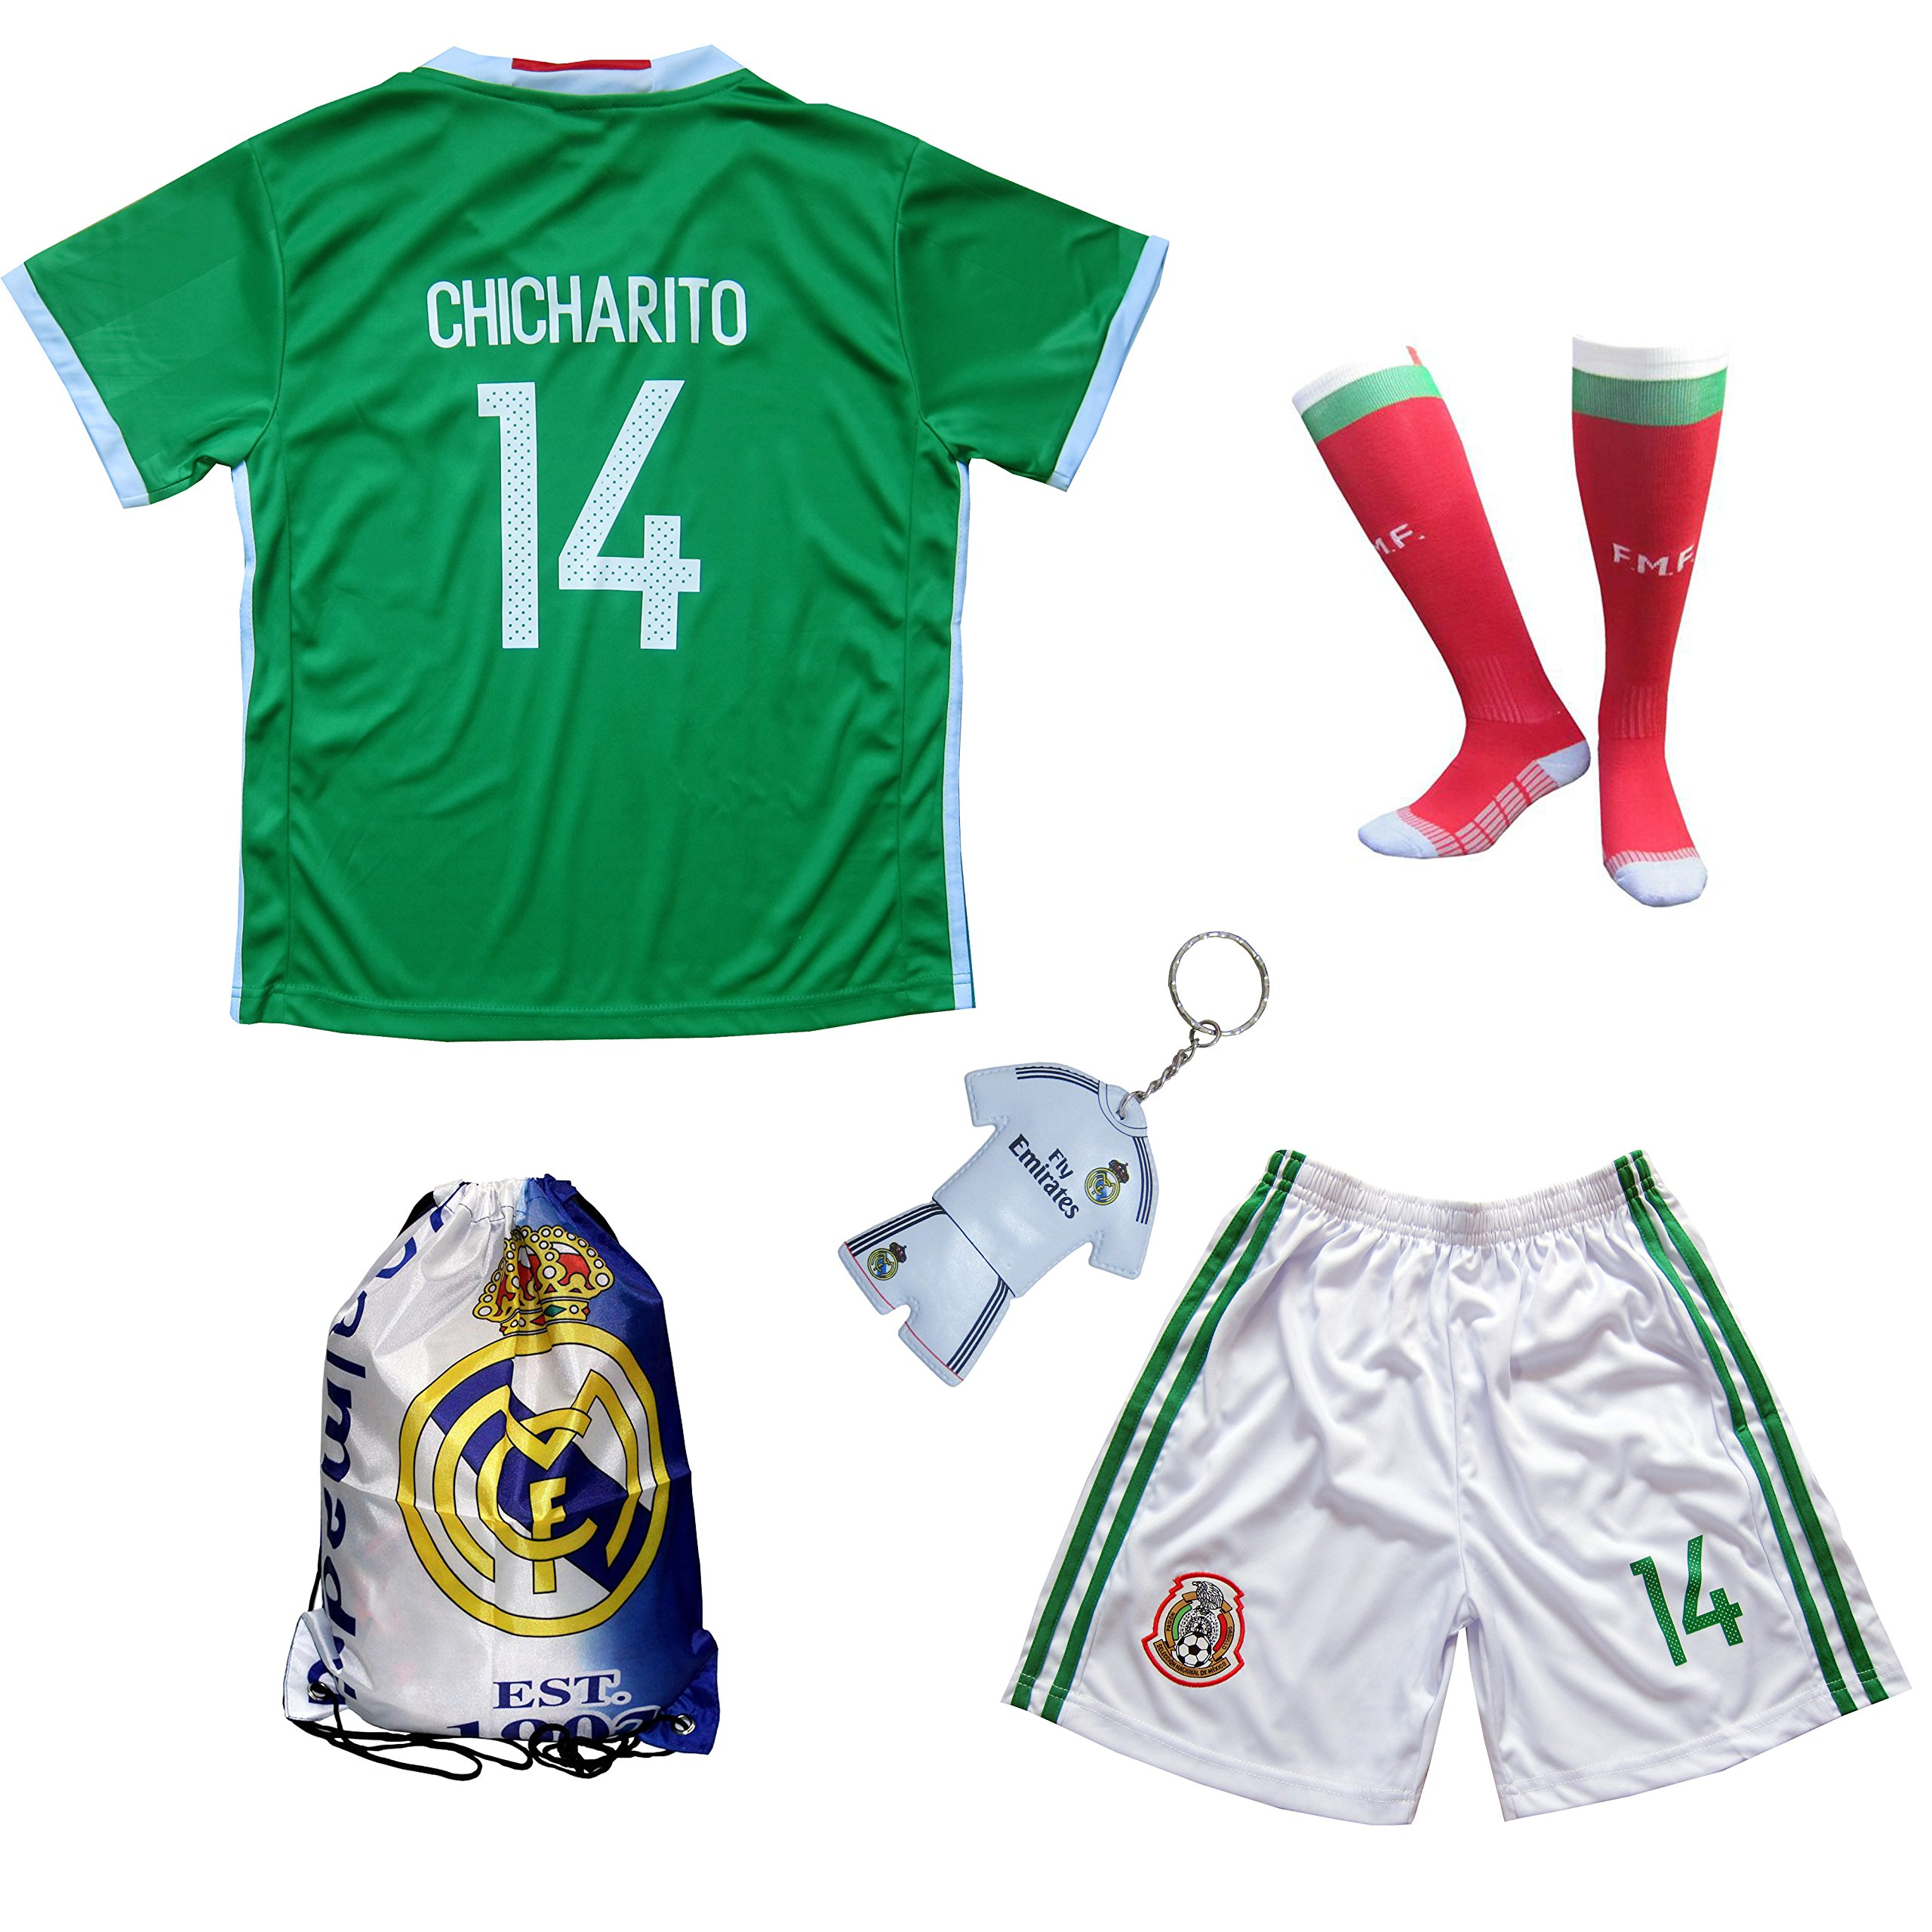 611fce69c9a KID BOX 2018 FWC Mexico  14 CHICHARITO Kids Home Soccer Jersey   Shorts  Socks Set